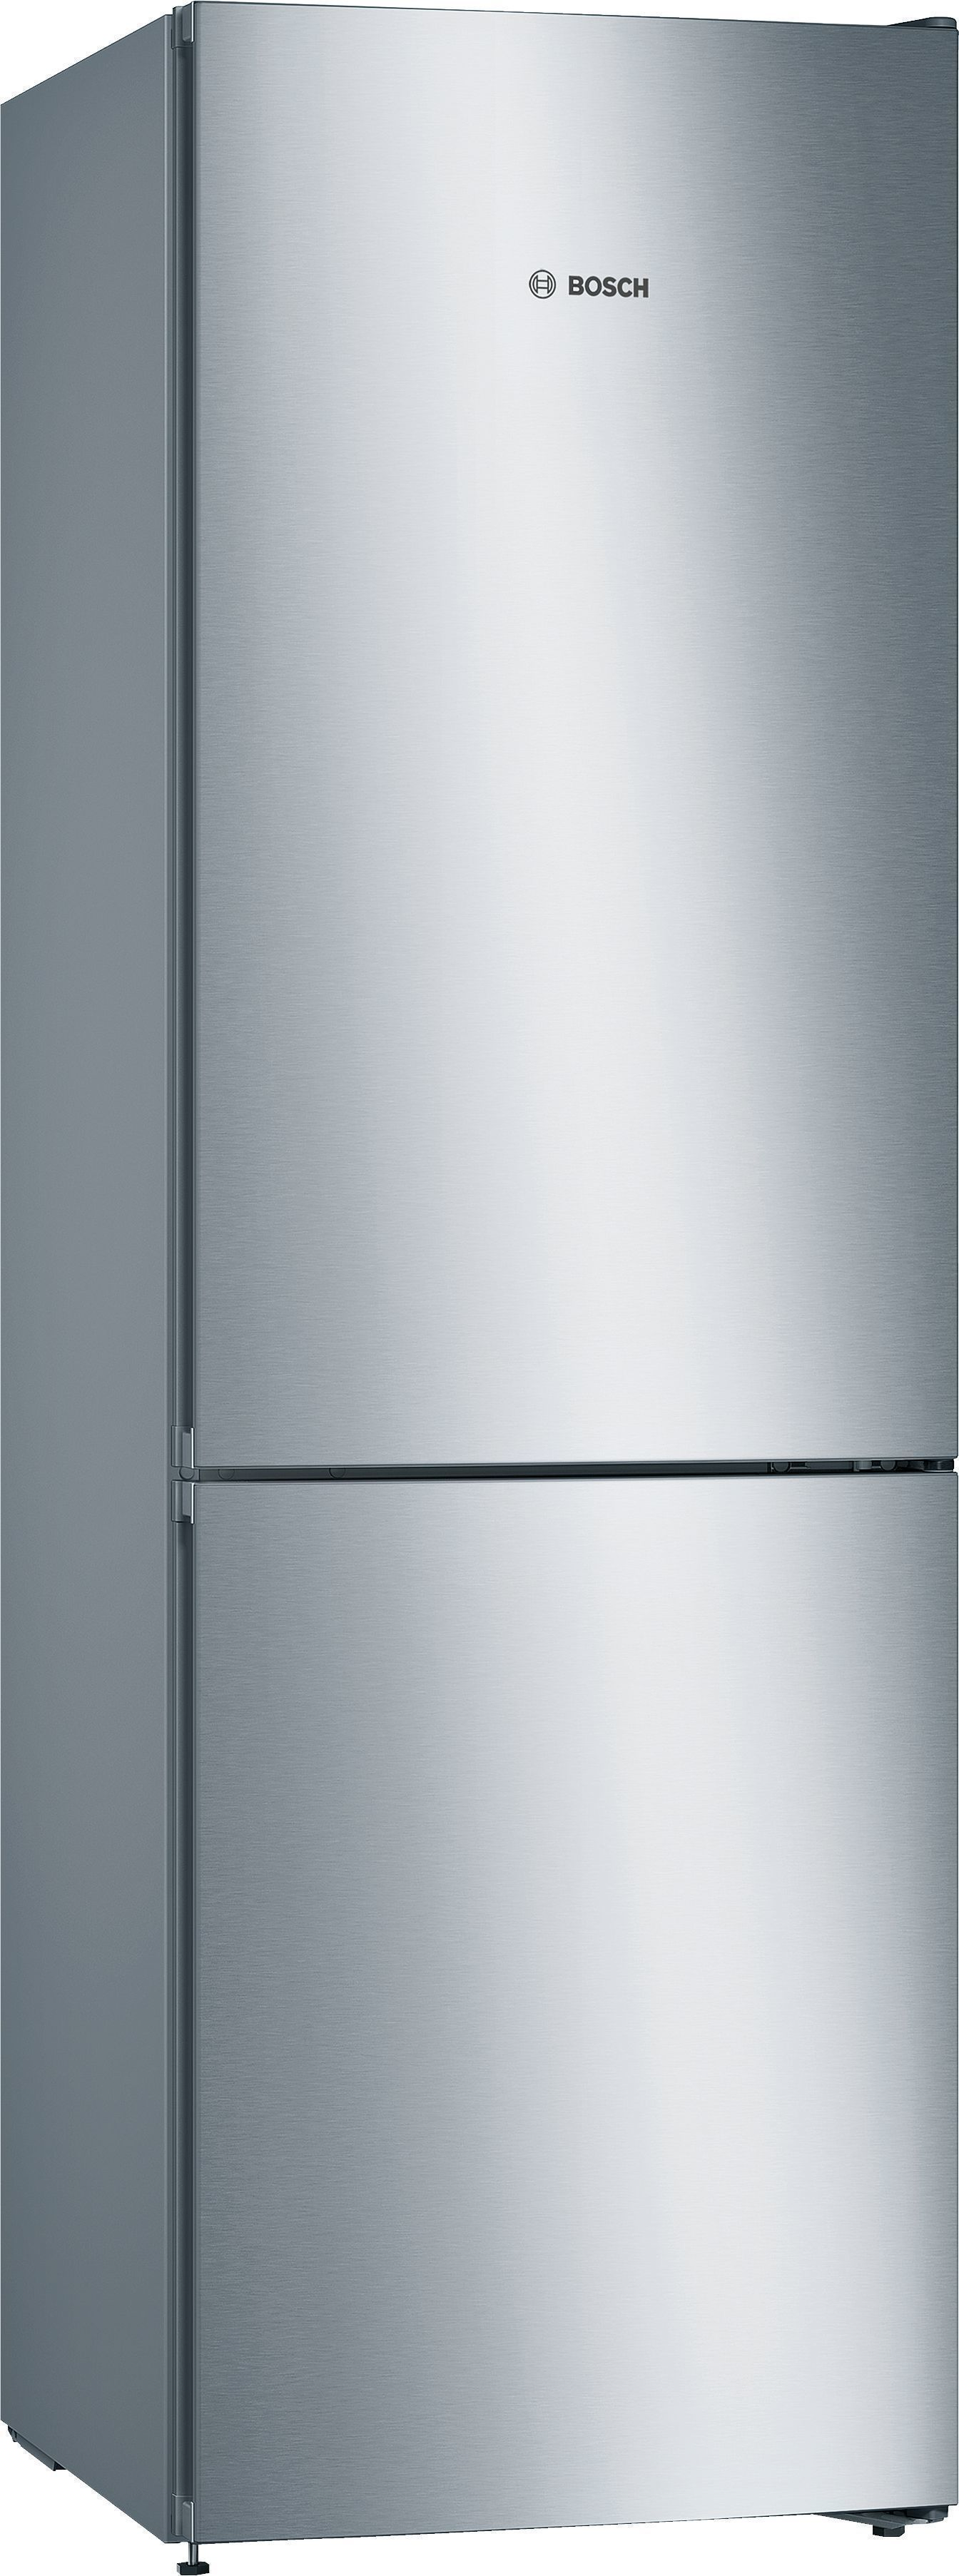 Frigorifico Bosch KGN36VIEA Combi 186 Nf Inox A++